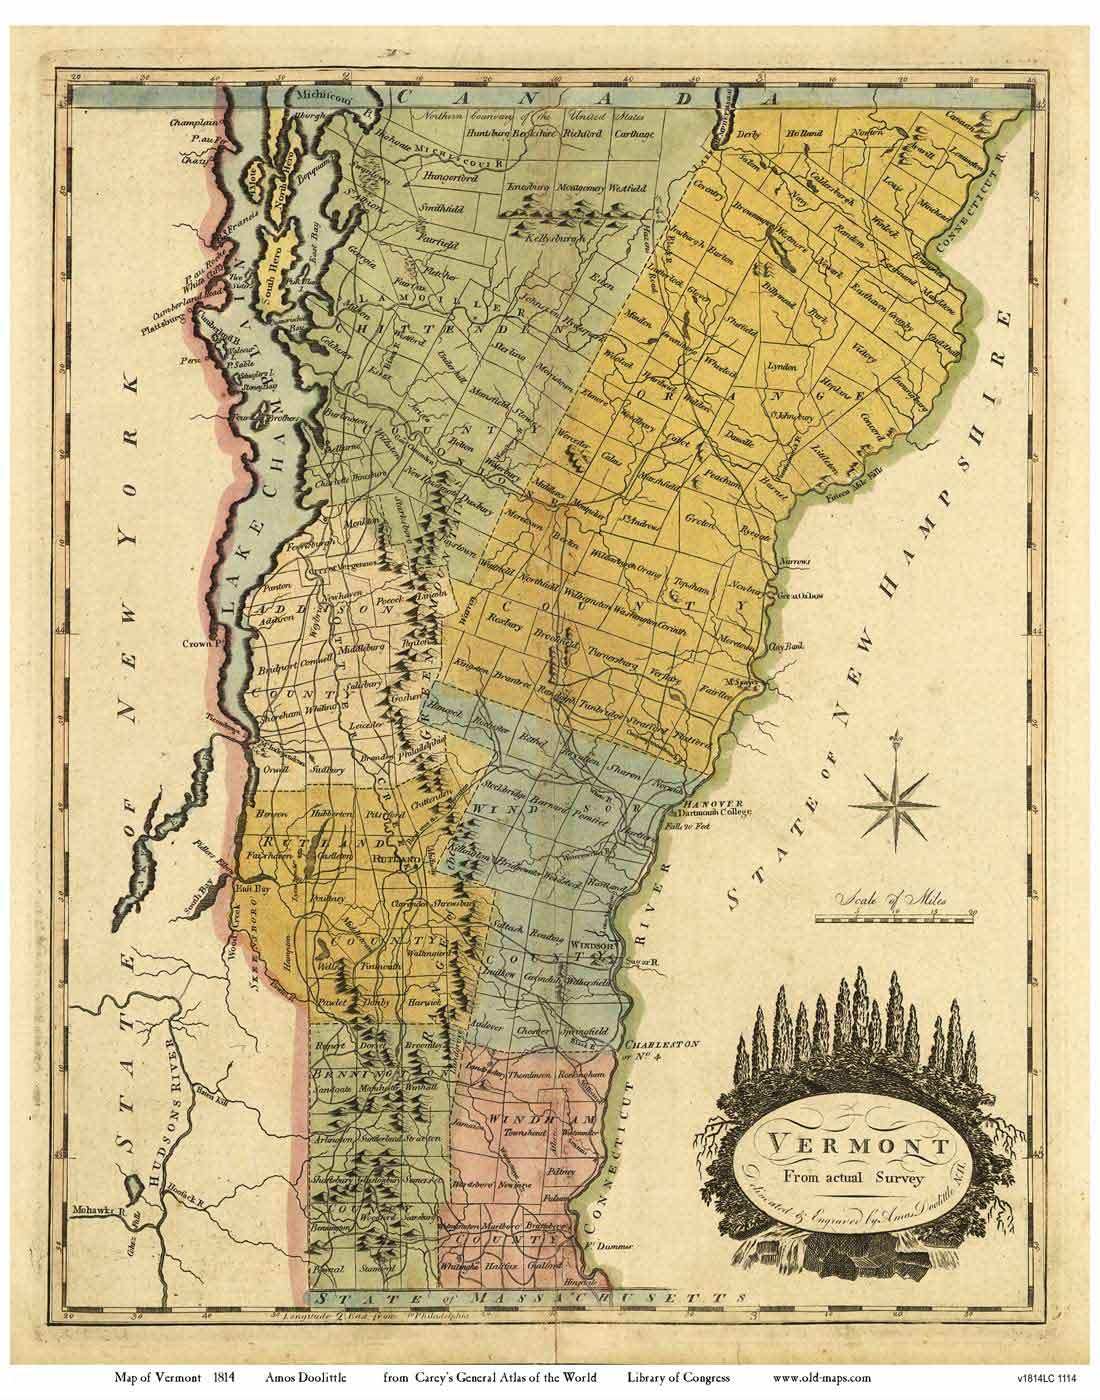 Doolittle Map of Vermont, 1814